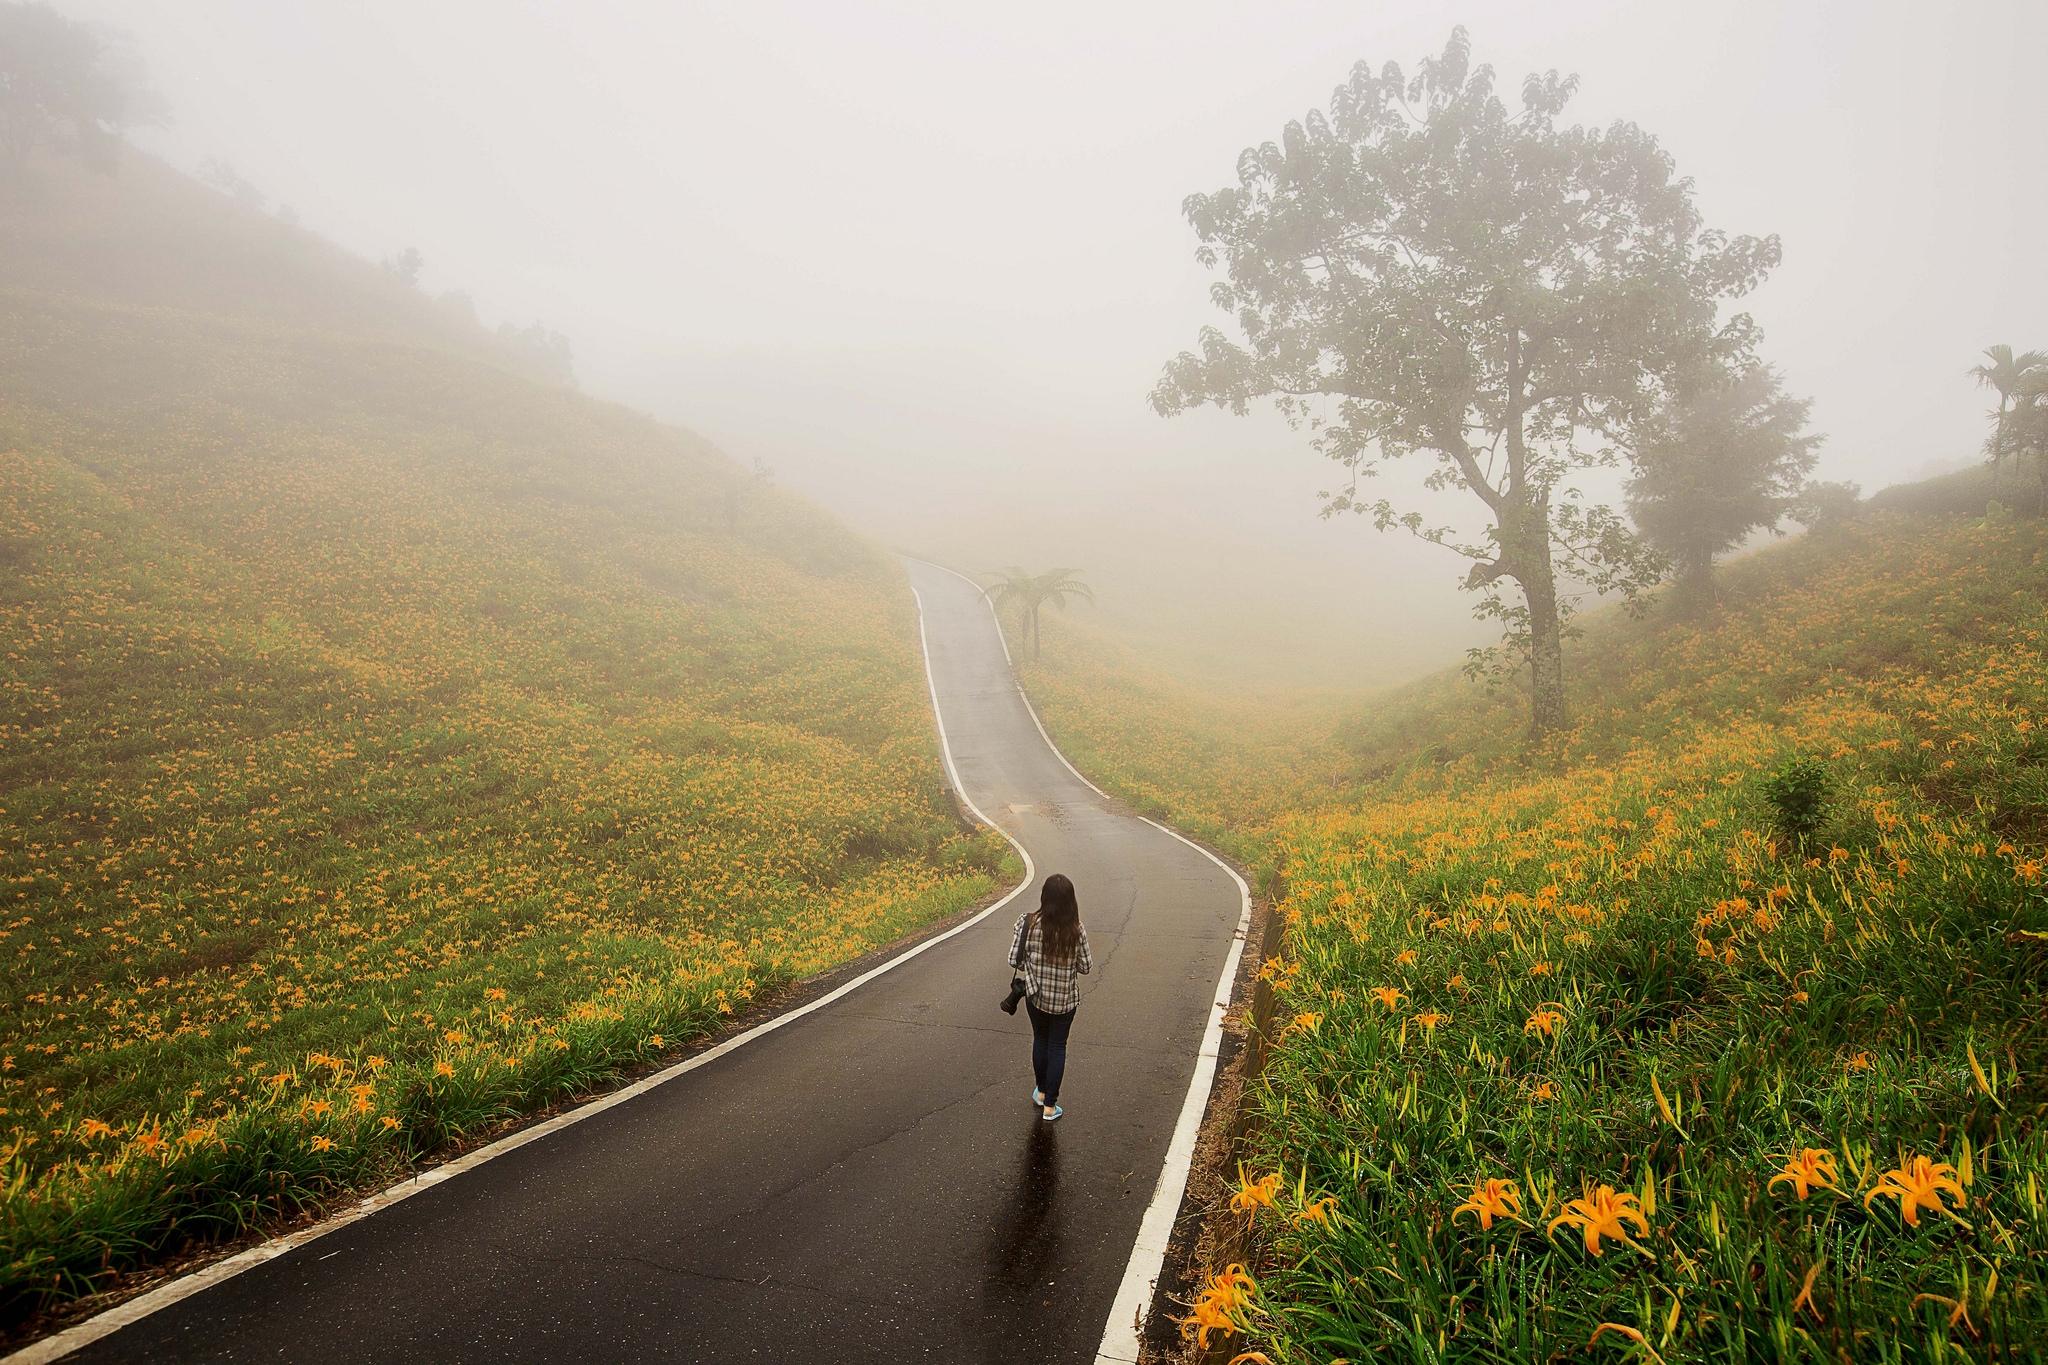 дорога это жизнь фото любят